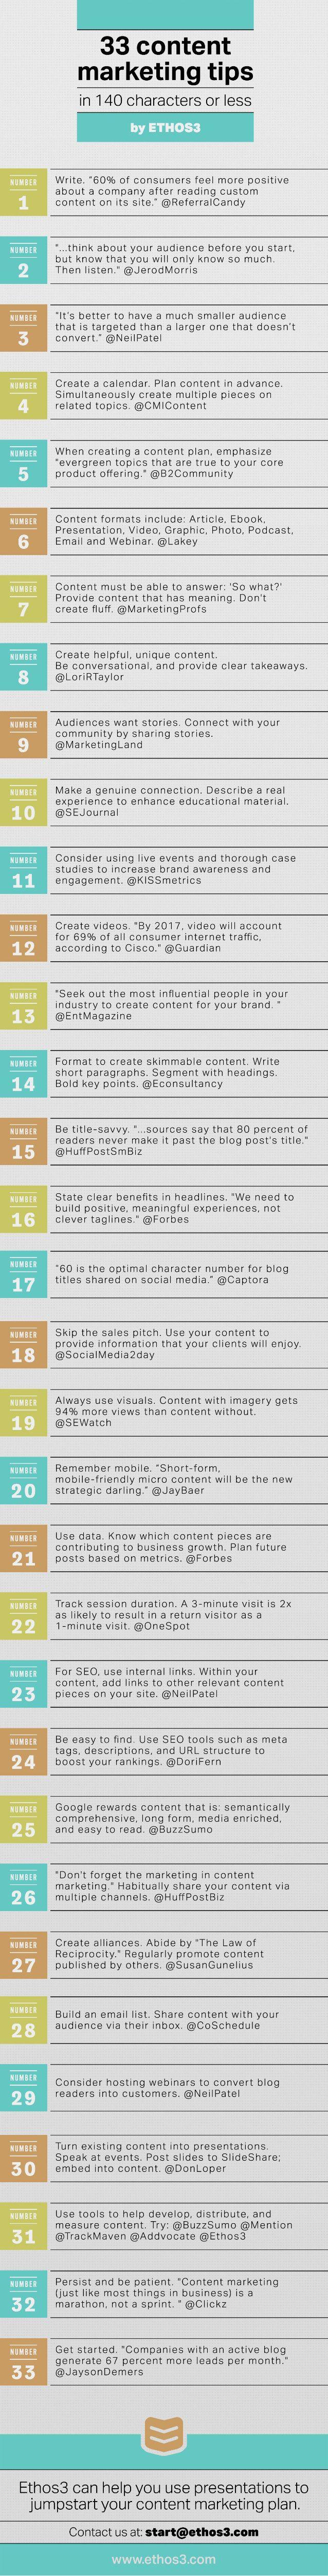 33 consejos sobre marketing de contenidos en 140 caracteres. #infographic